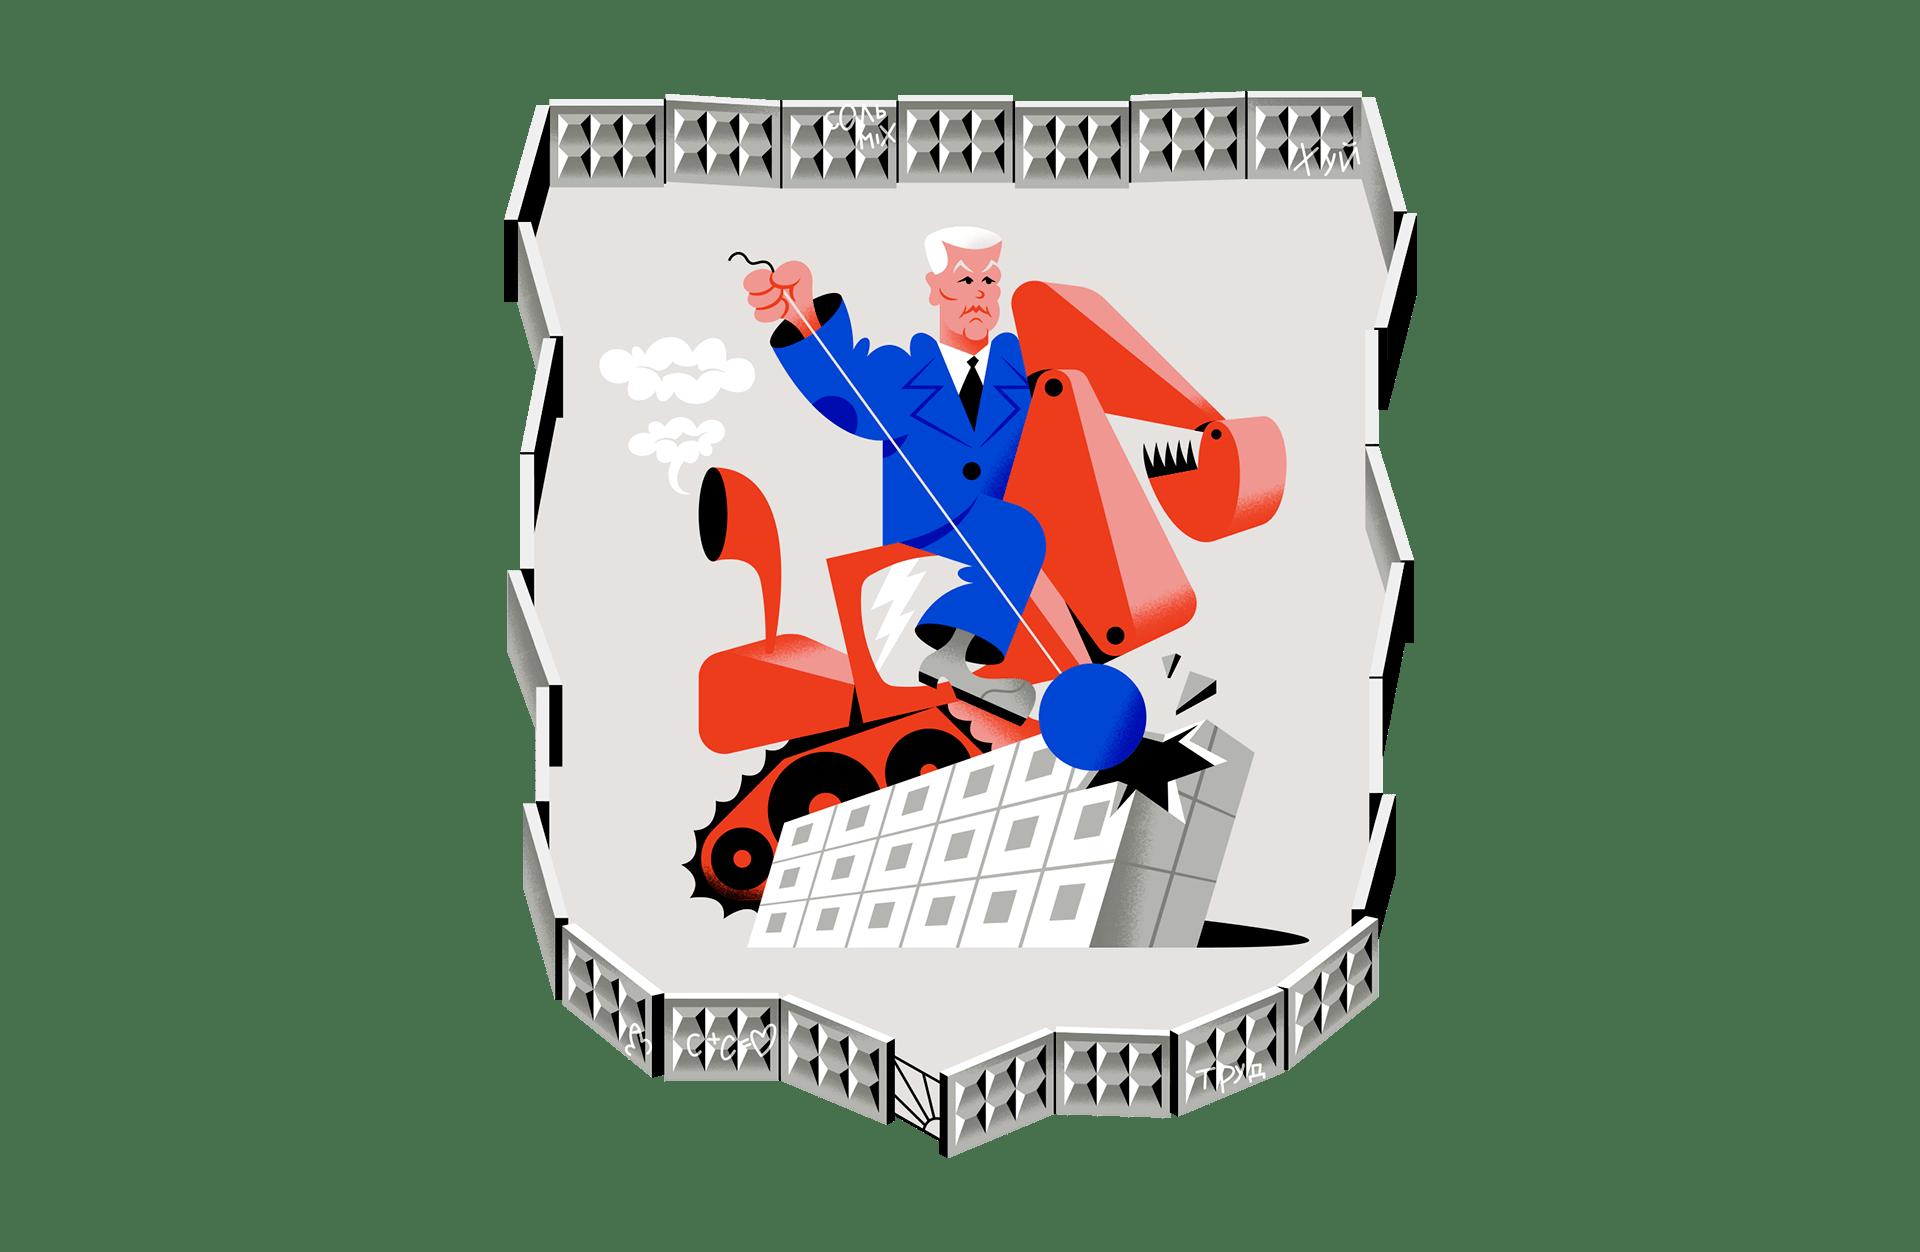 05 - Новый герб Москвы